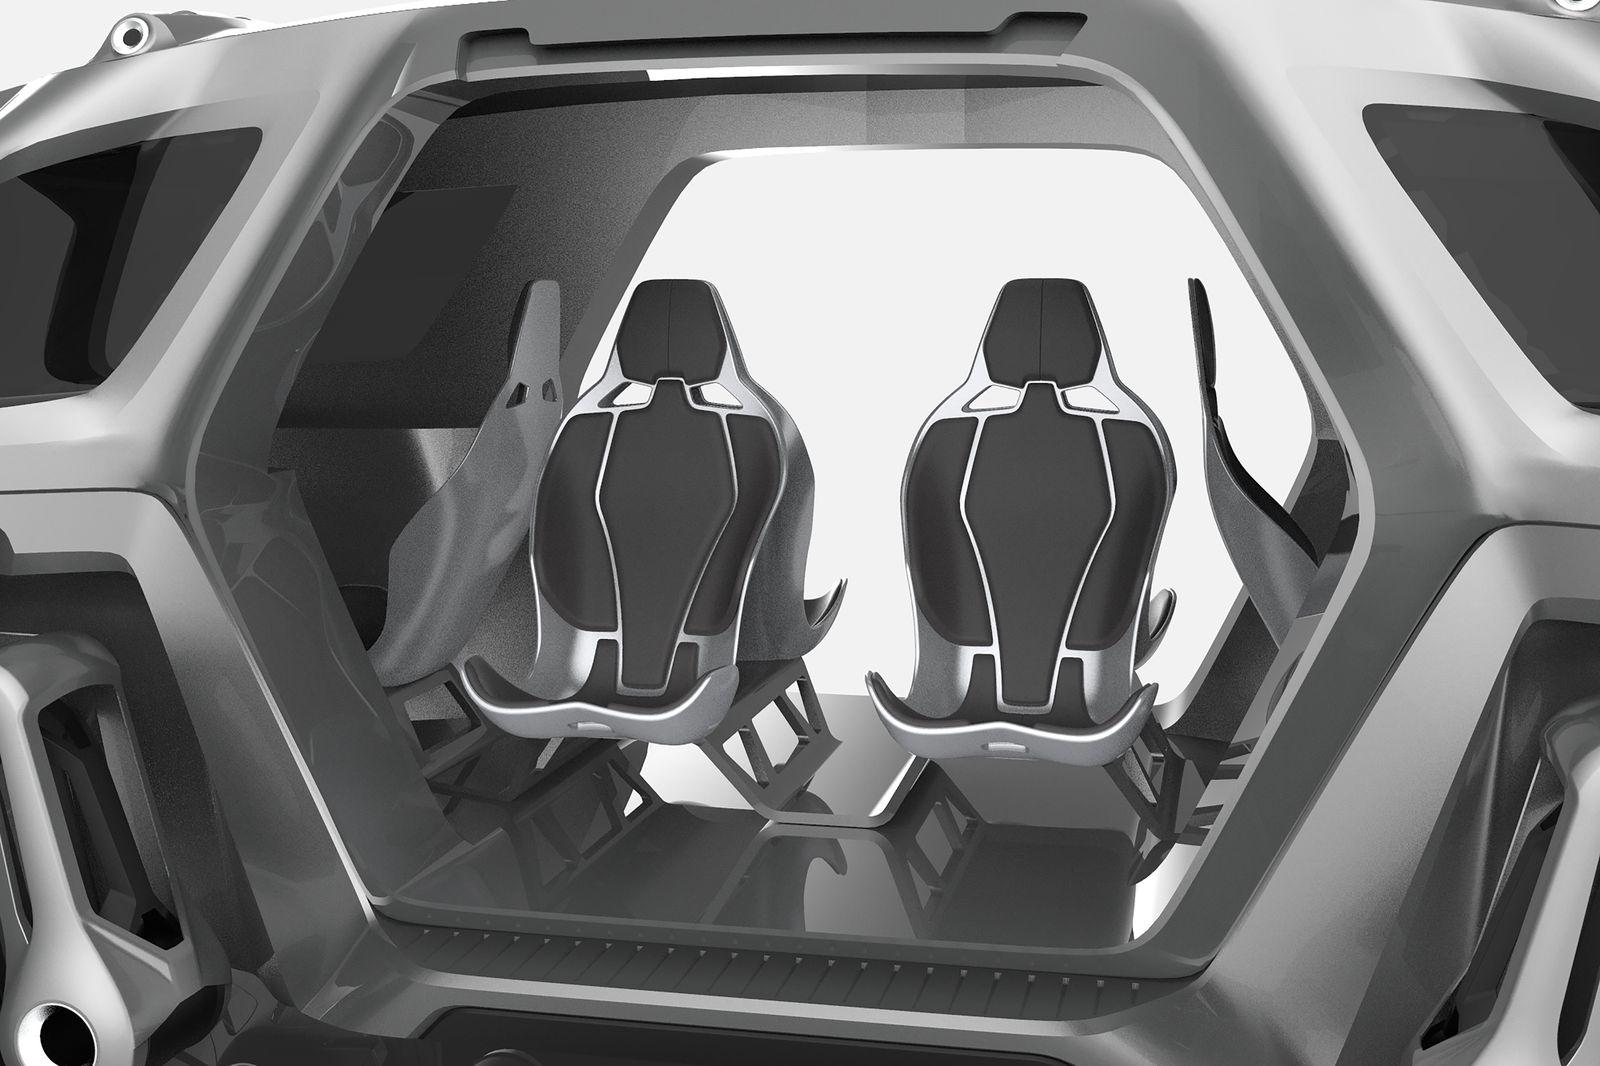 HyundaiElevate_AutoRok_2019_08